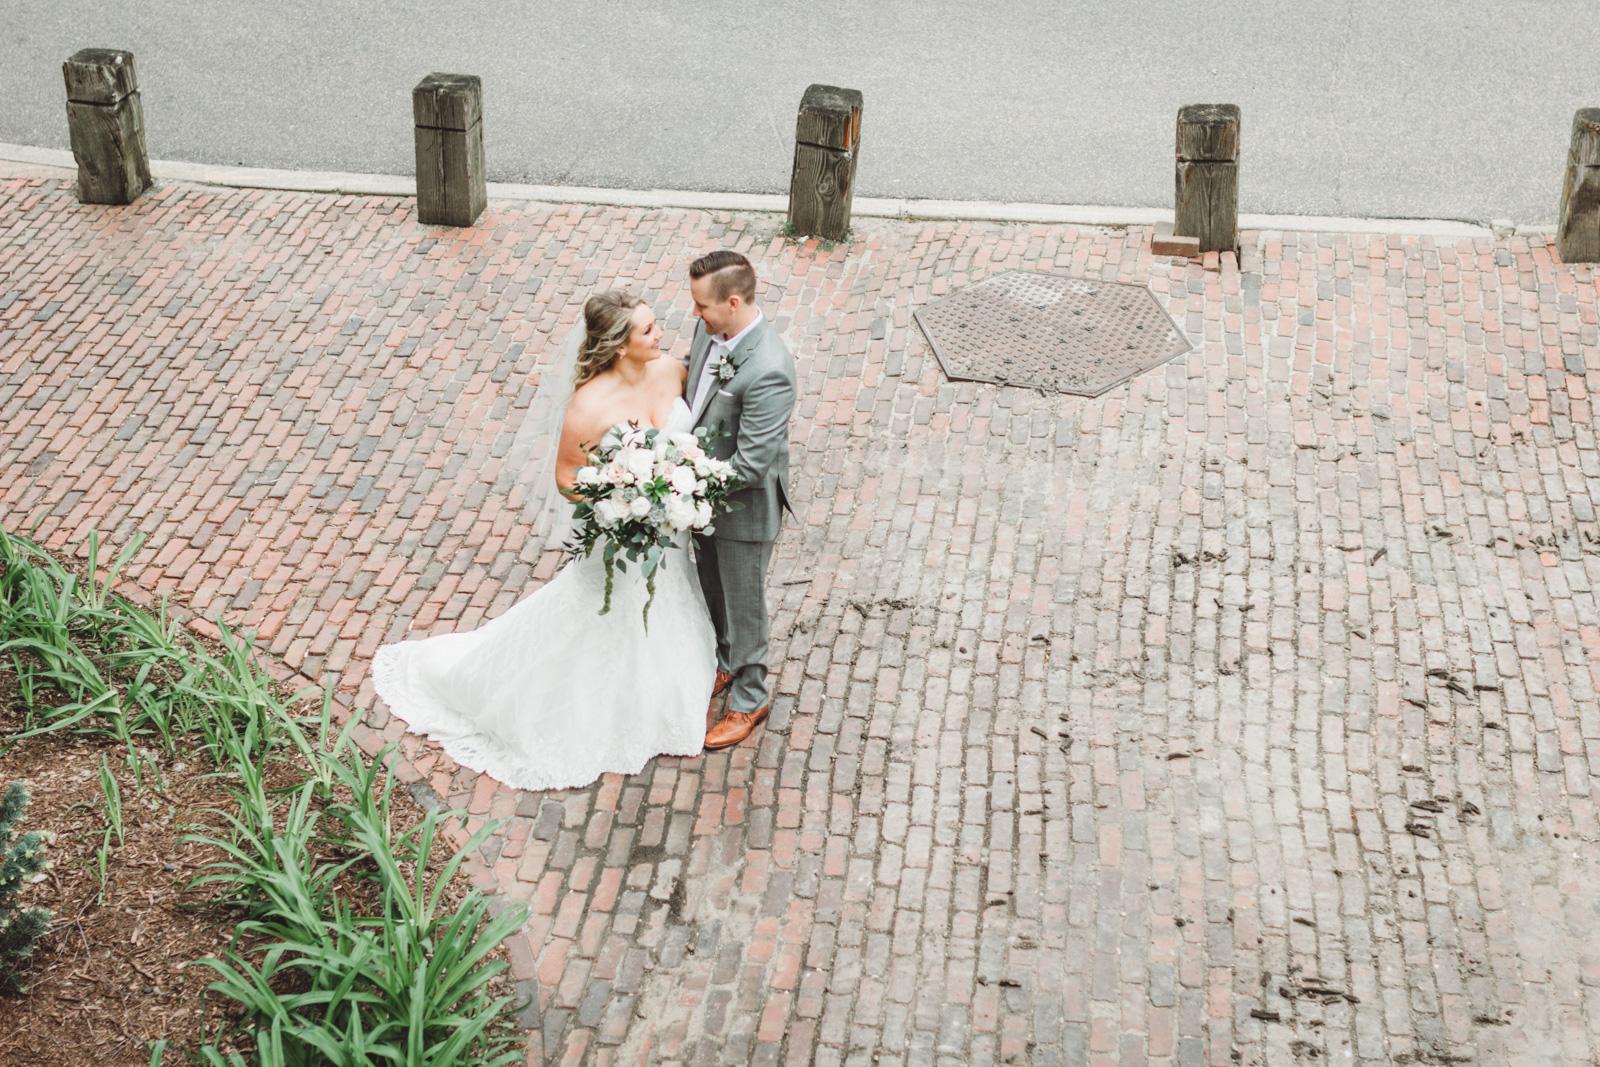 Amanda&Nick-wed-167.jpg